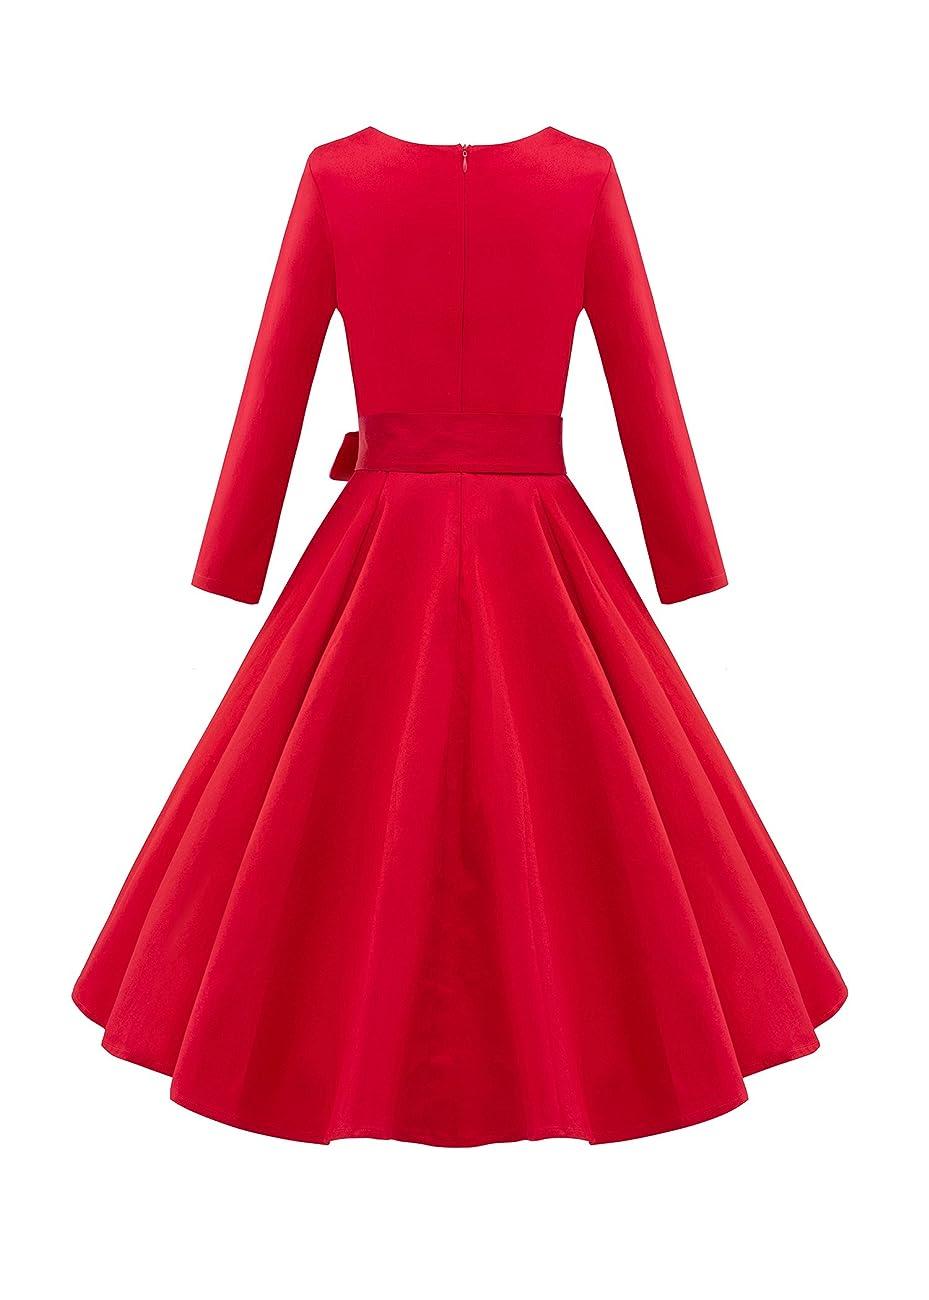 LUOUSE Audrey Hepburn 3/4 Sleeve 1950s Vintage Rockabilly Dress 2